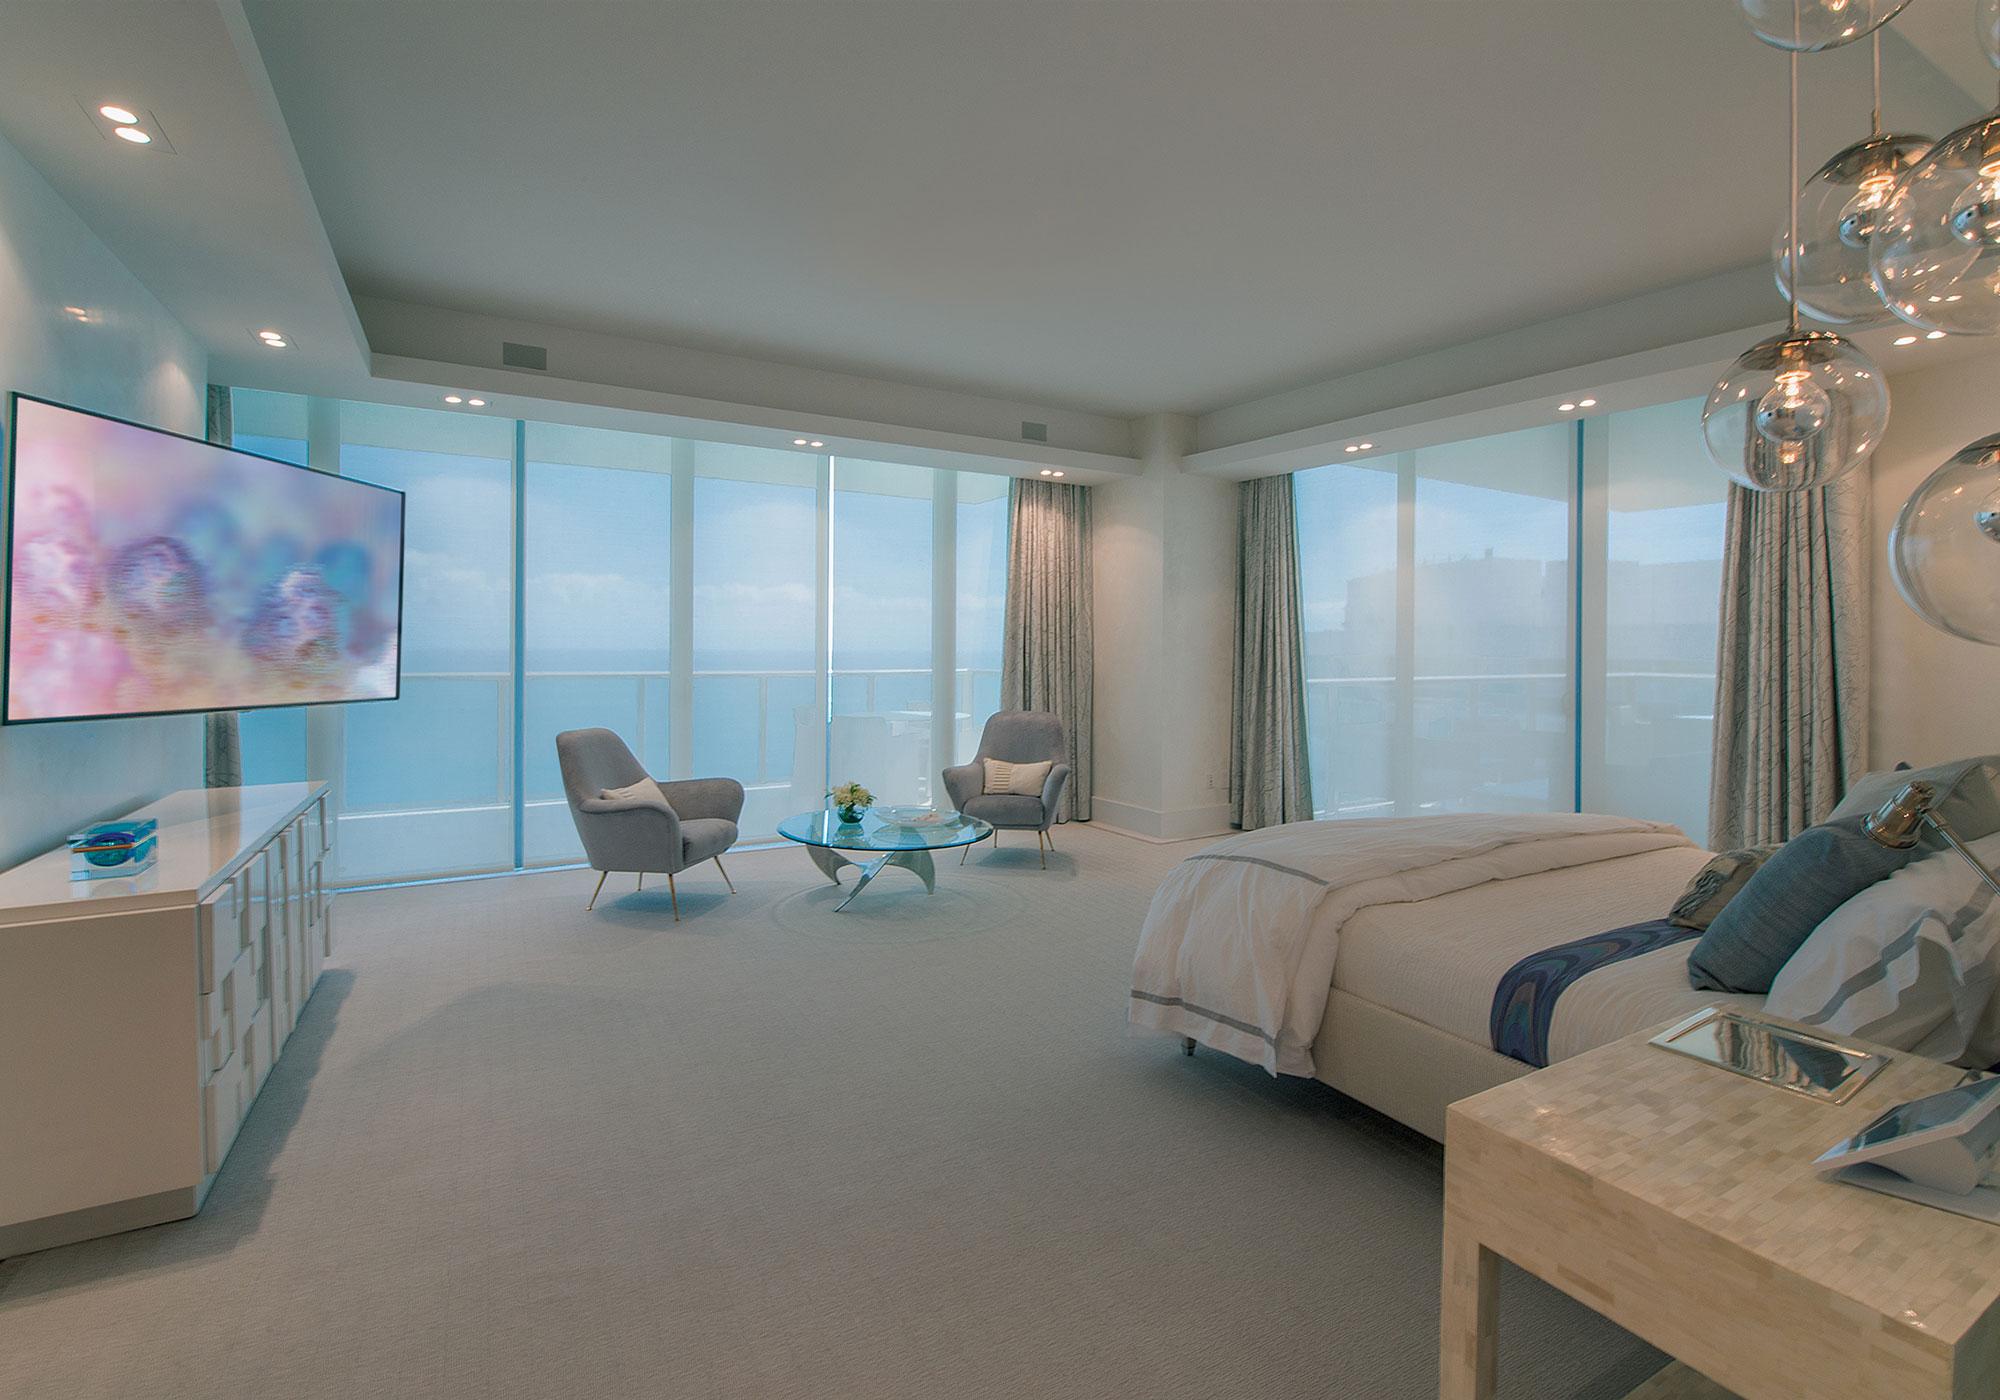 bedroom, shades, solar shades, draperies, tv, articulating arm